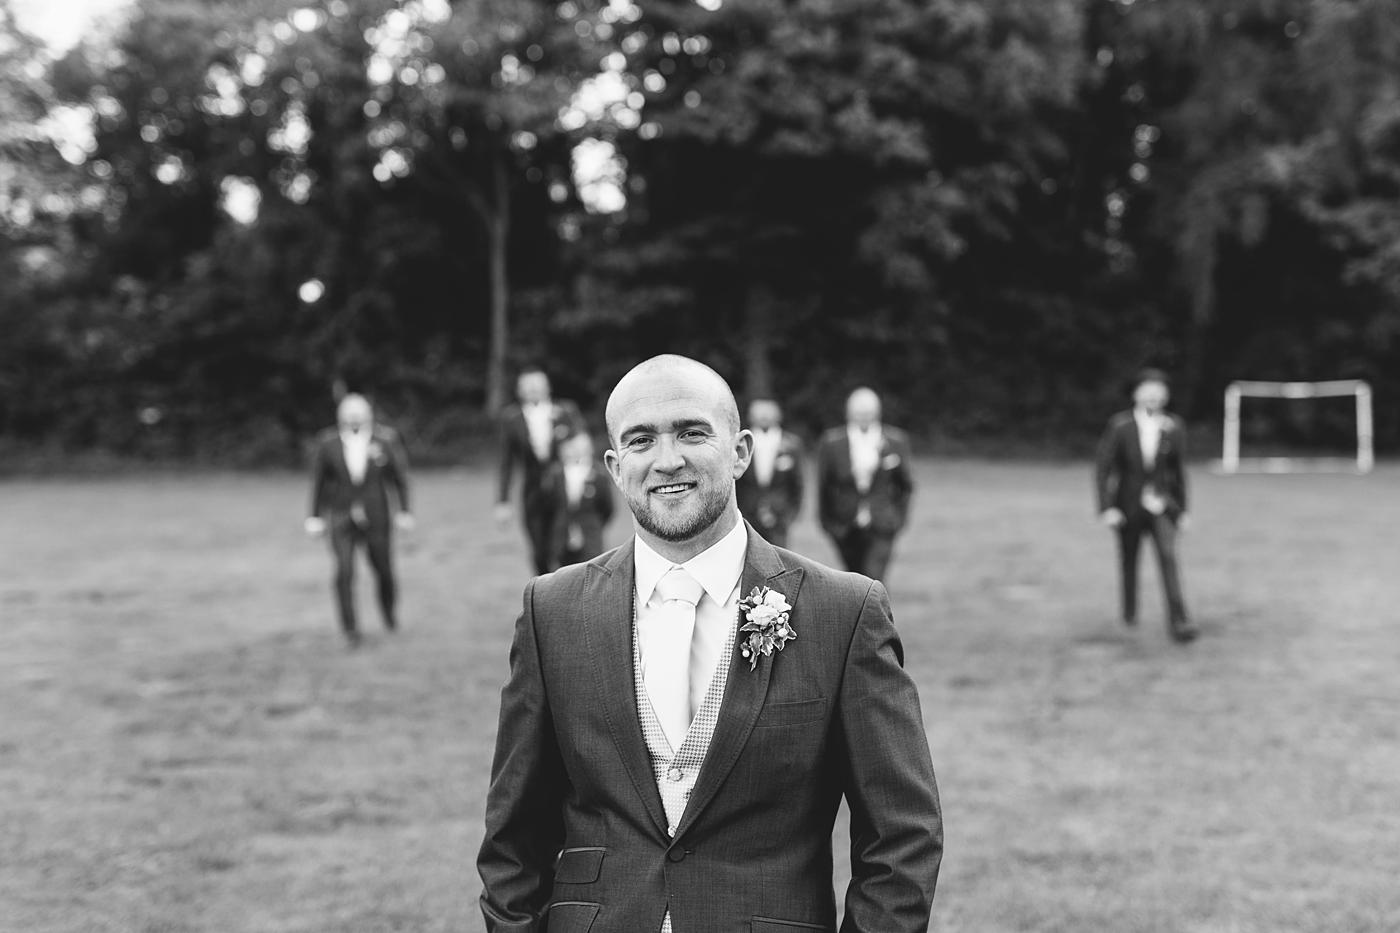 Winstanstow wedding photography 0957